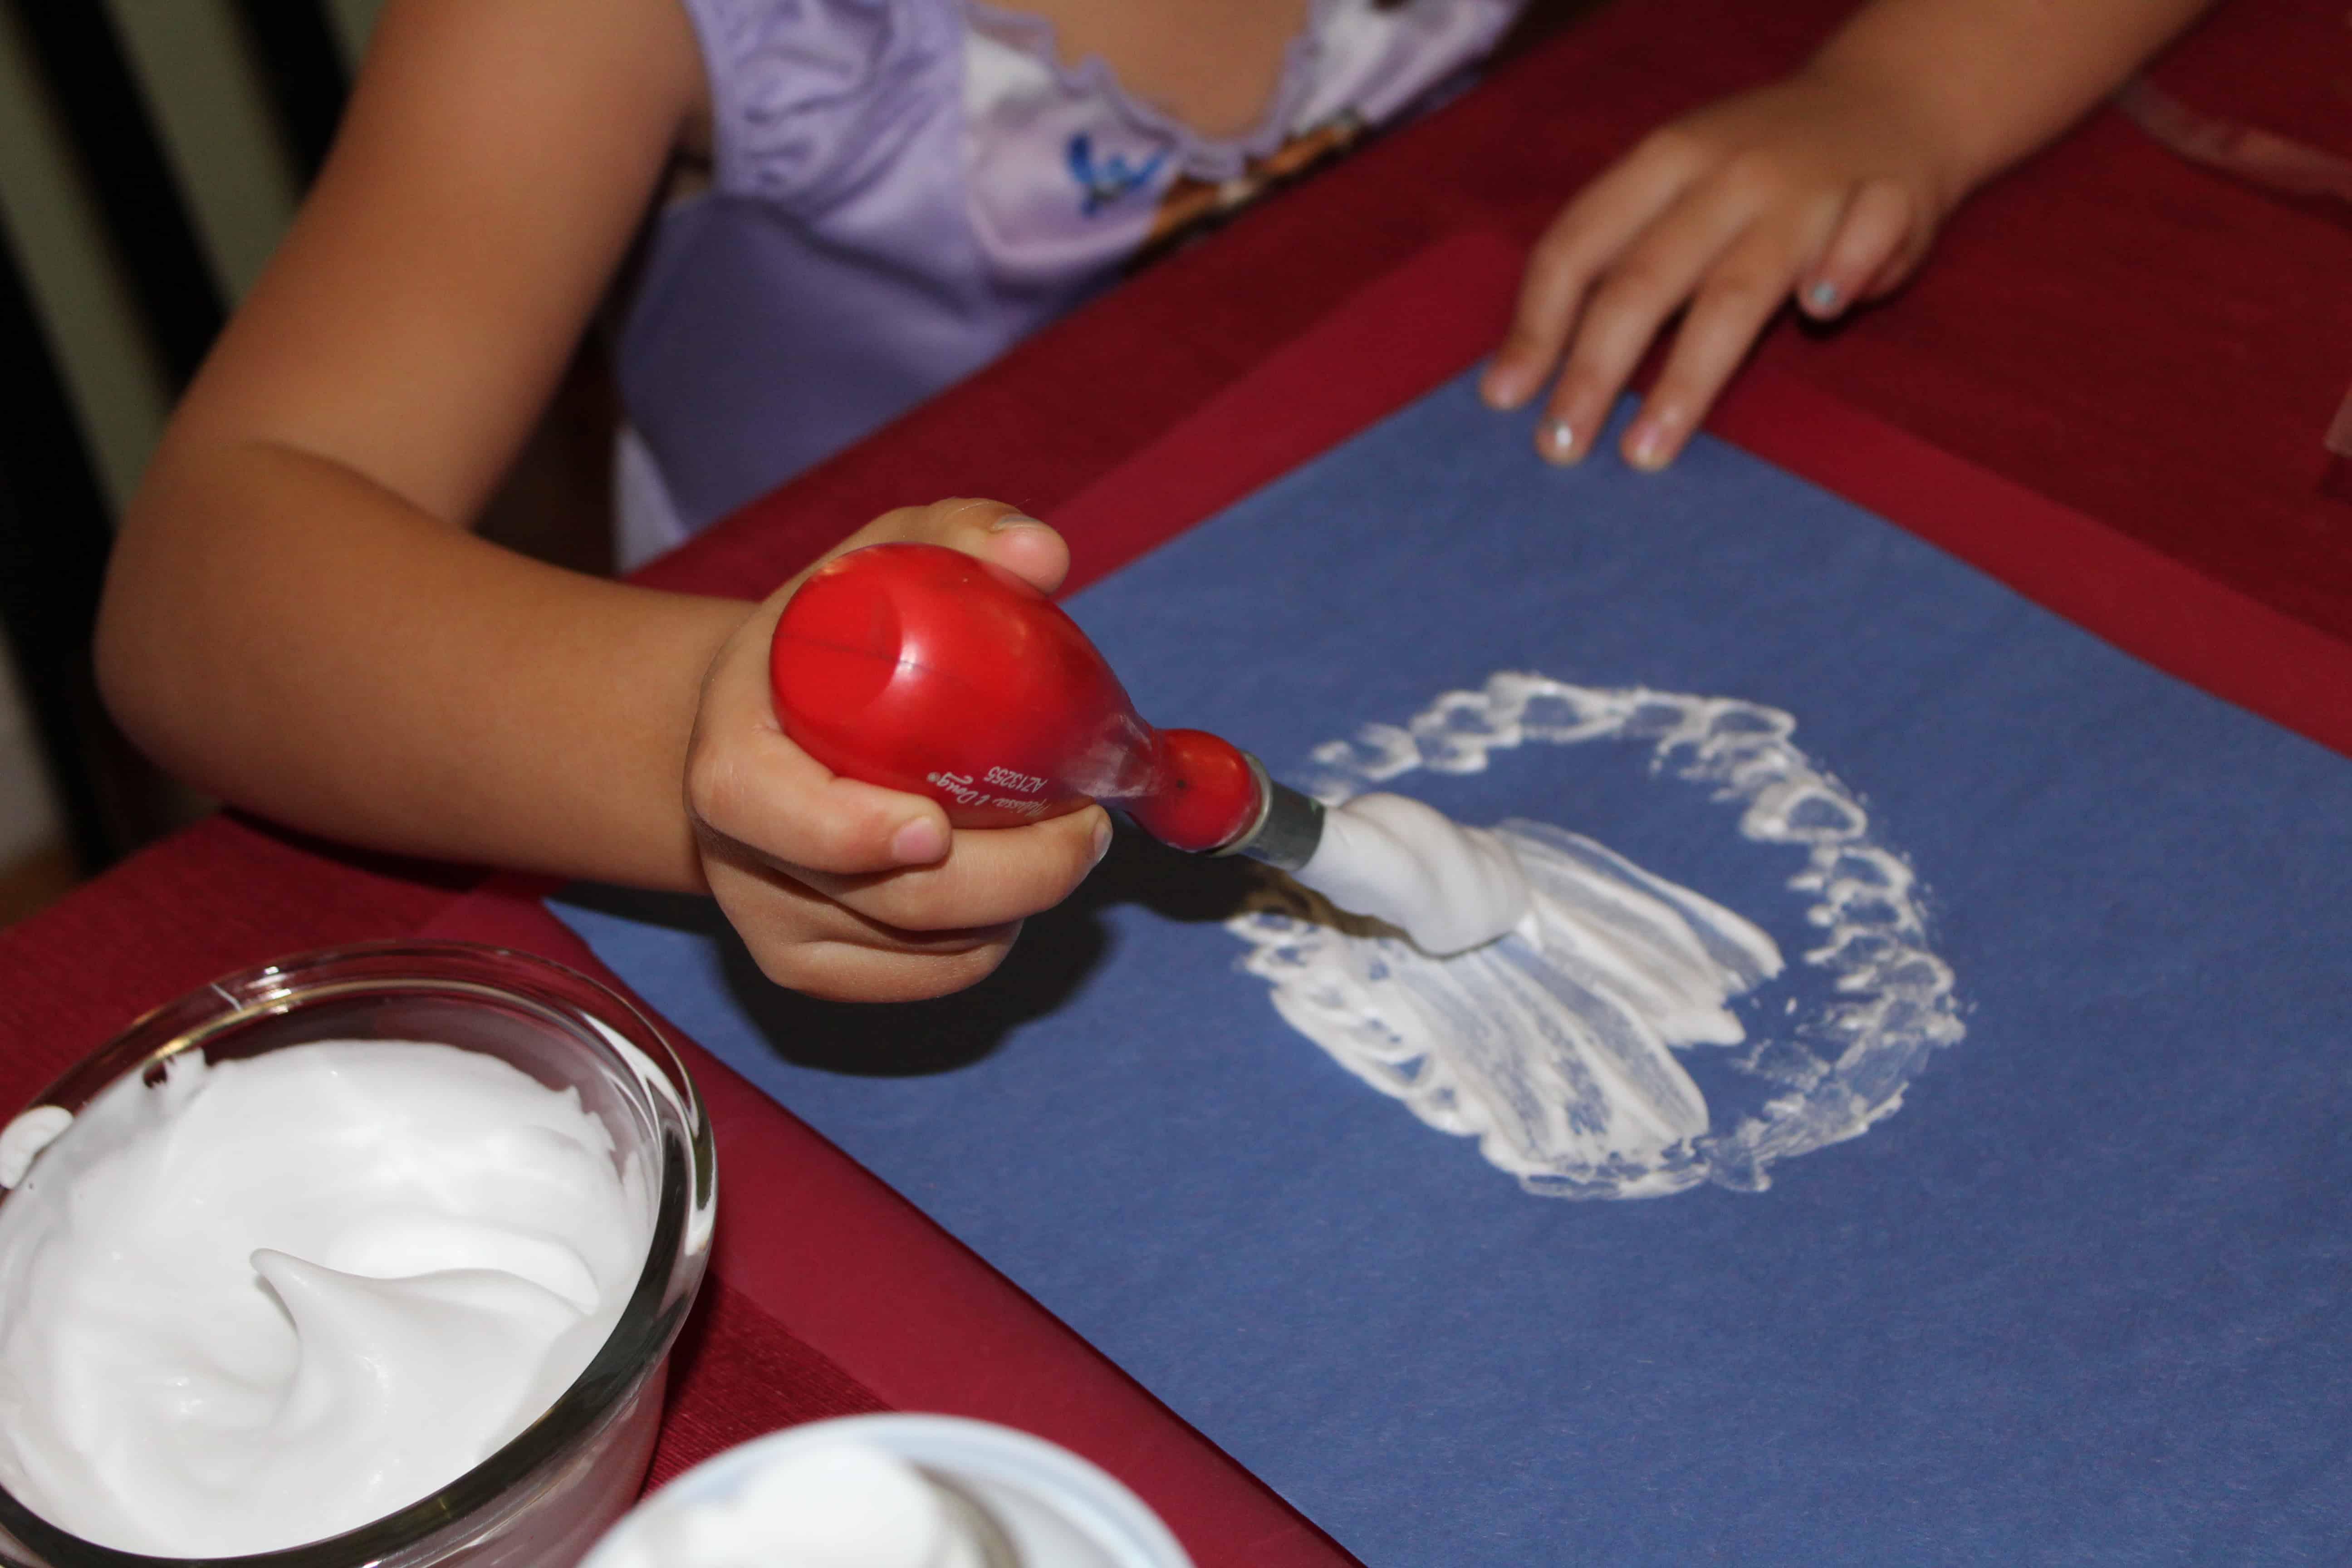 preschooler painting with shaving cream